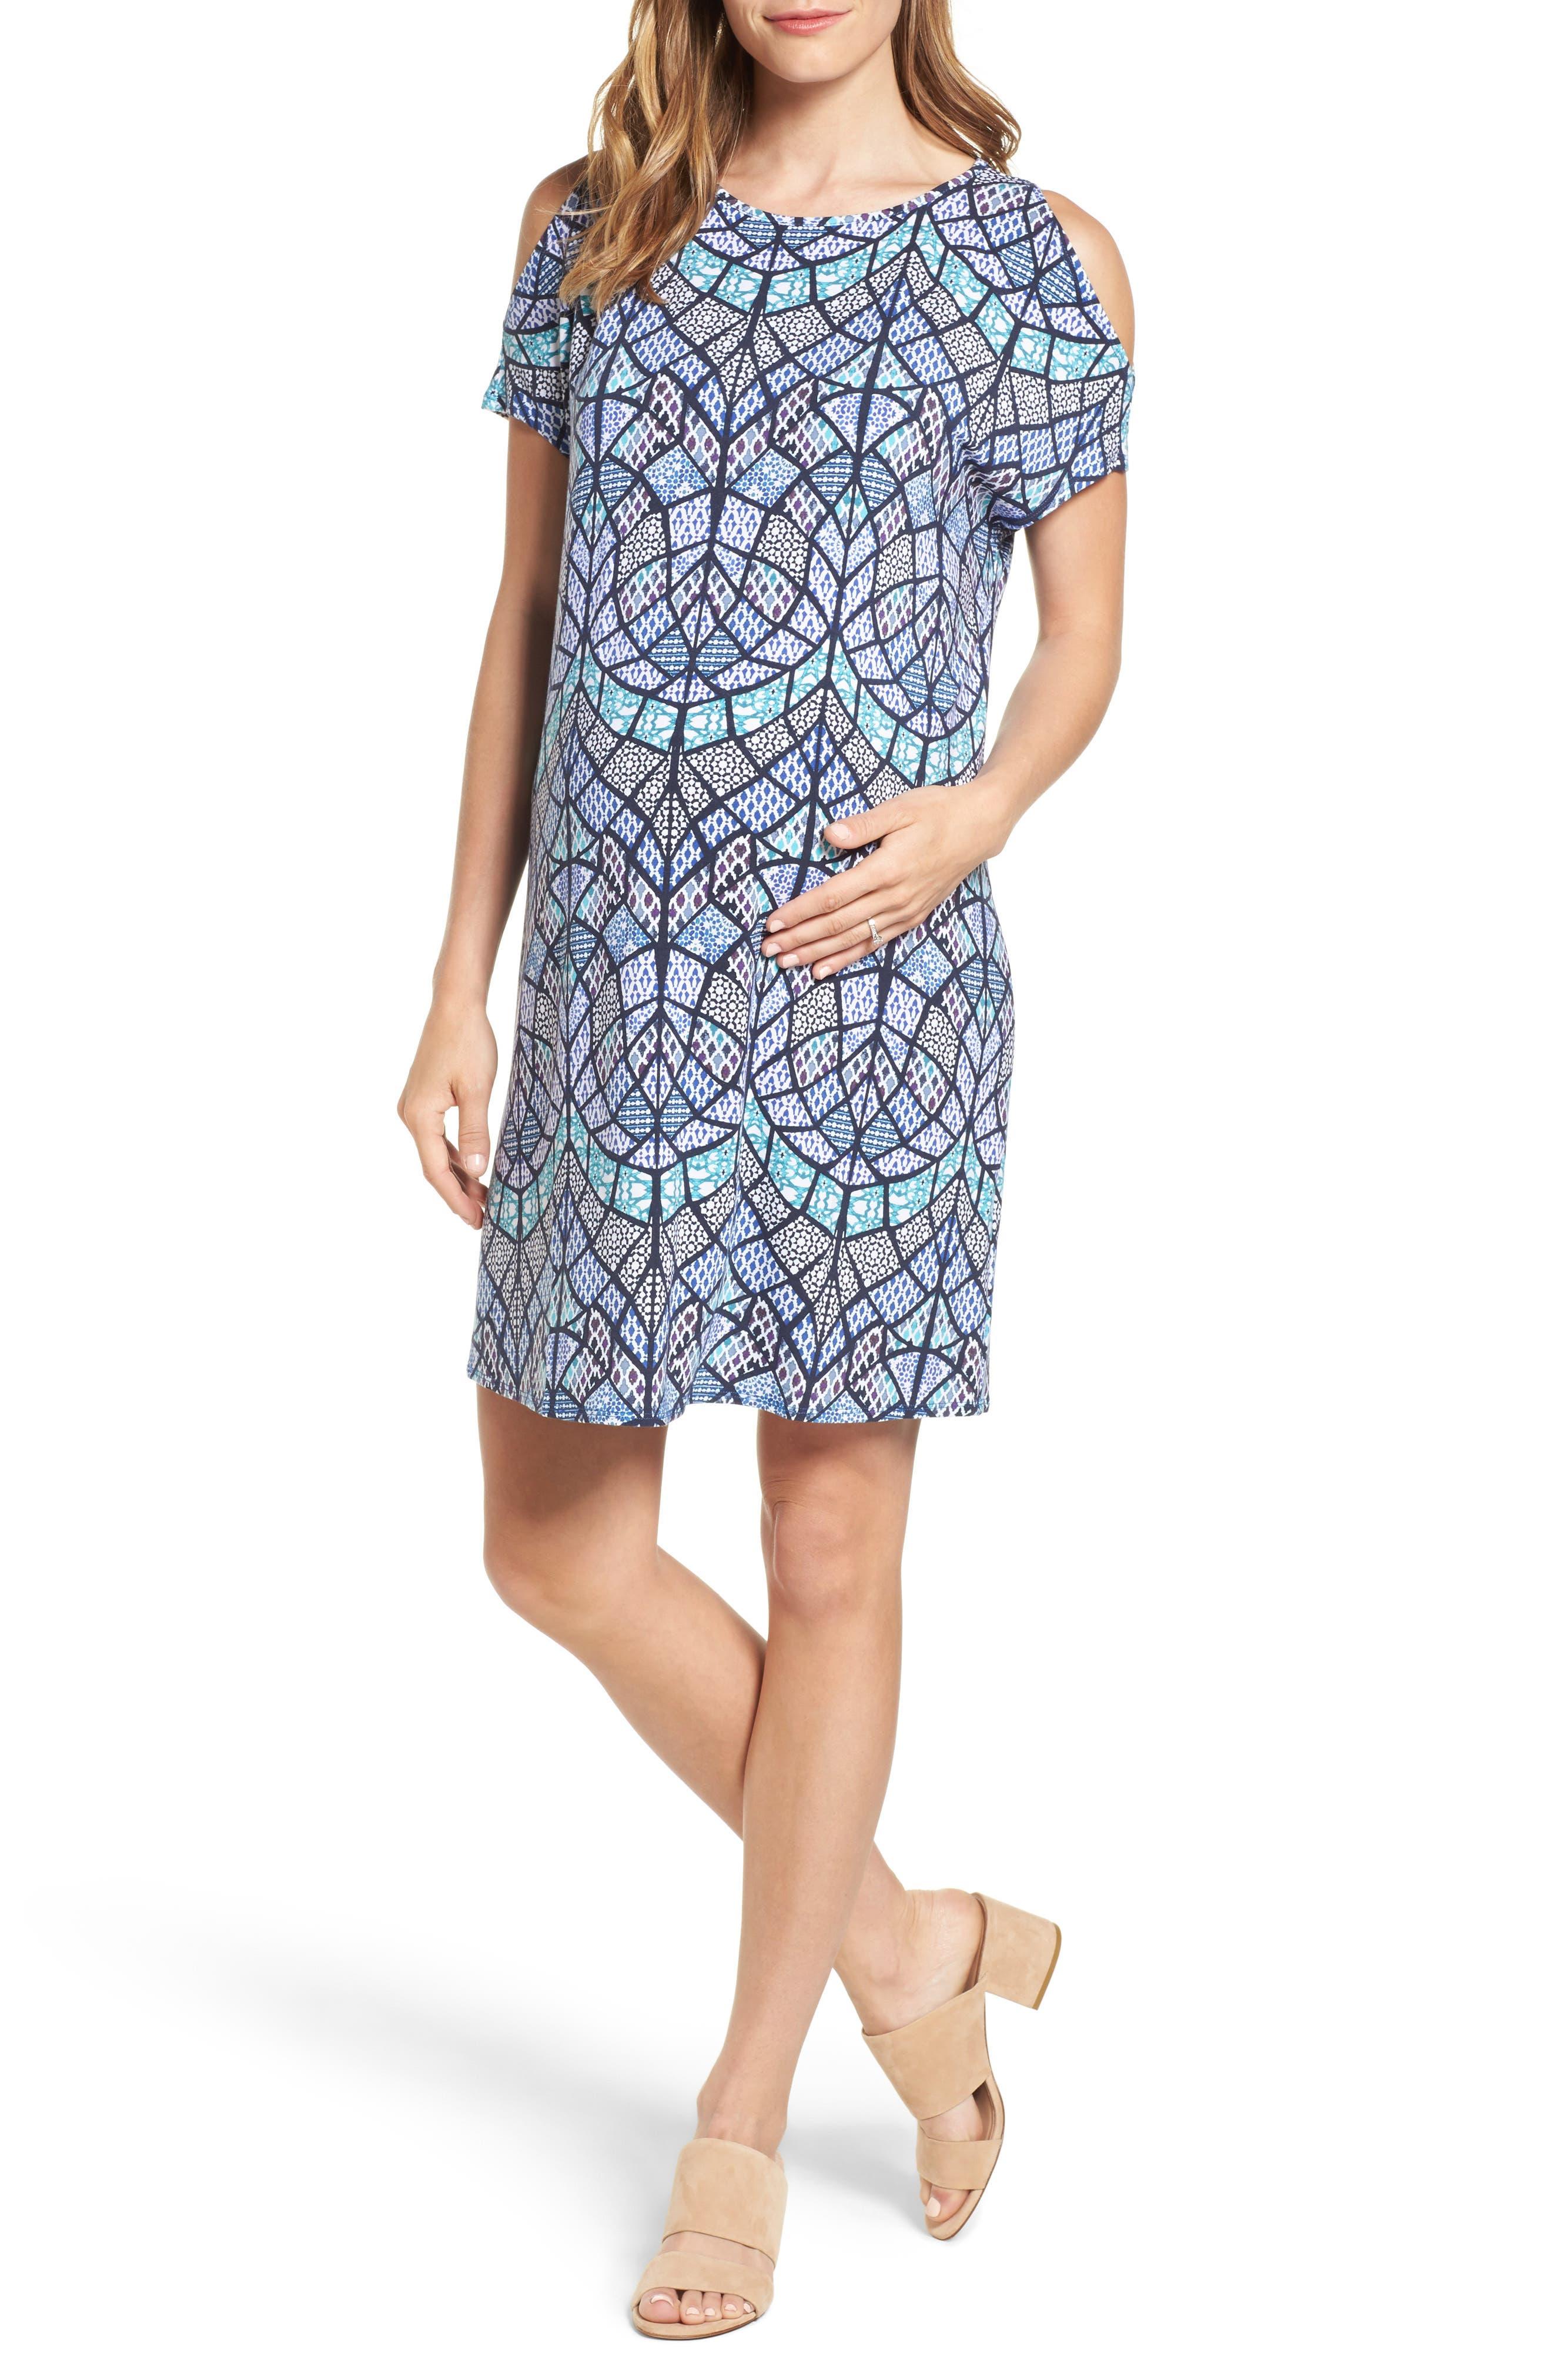 Alternate Image 1 Selected - Tart Maternity Caia Cold Shoulder Maternity Dress